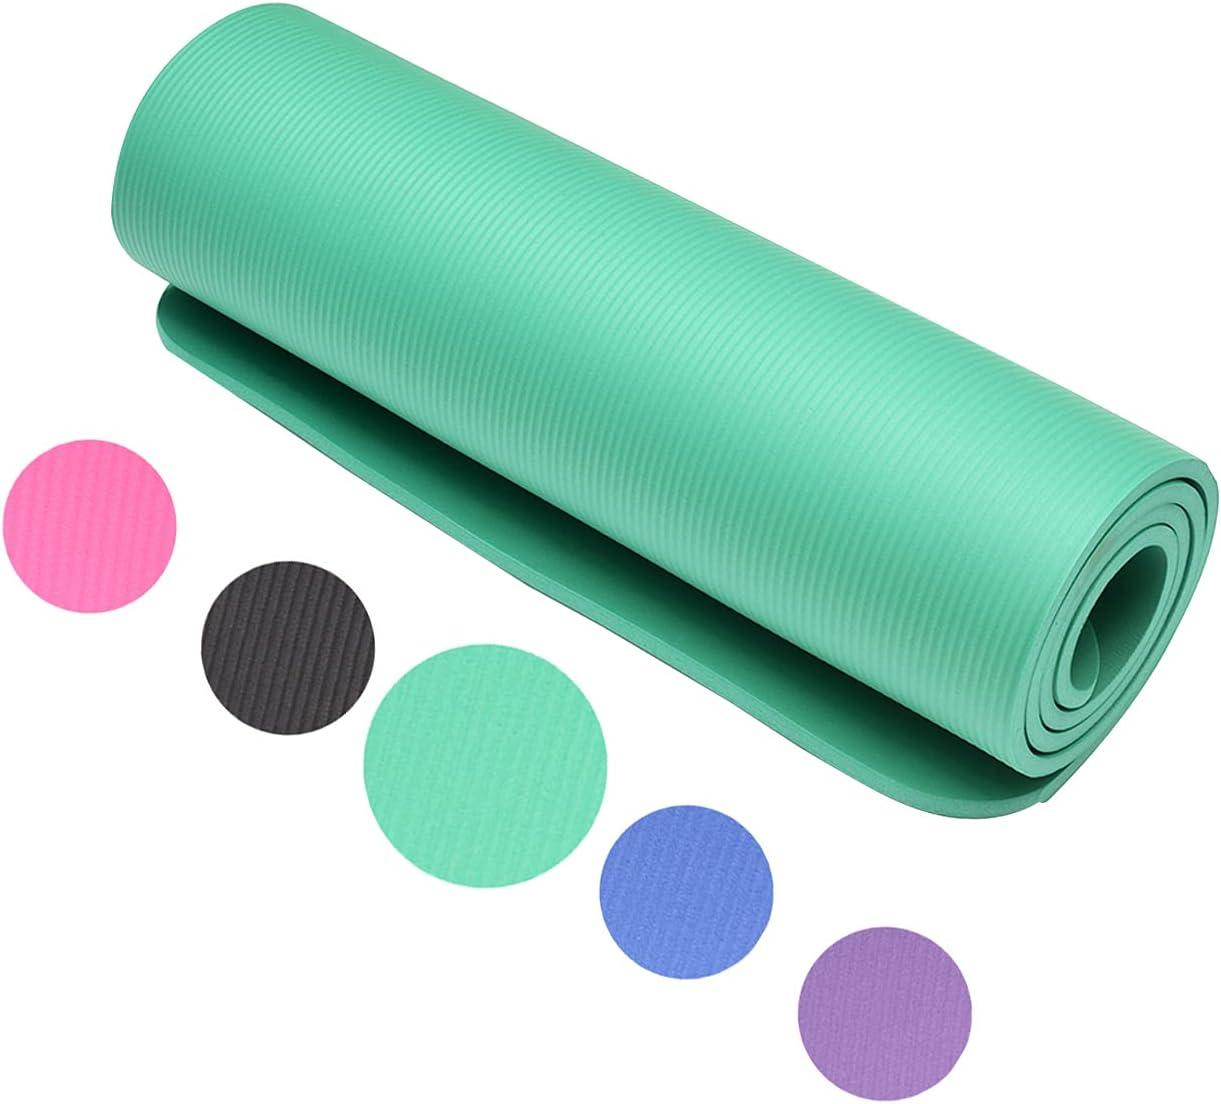 Yoga Max 43% OFF Mat BOBOHOO 10mm NBR Non-Slip Foam Comfort Fitnes Branded goods